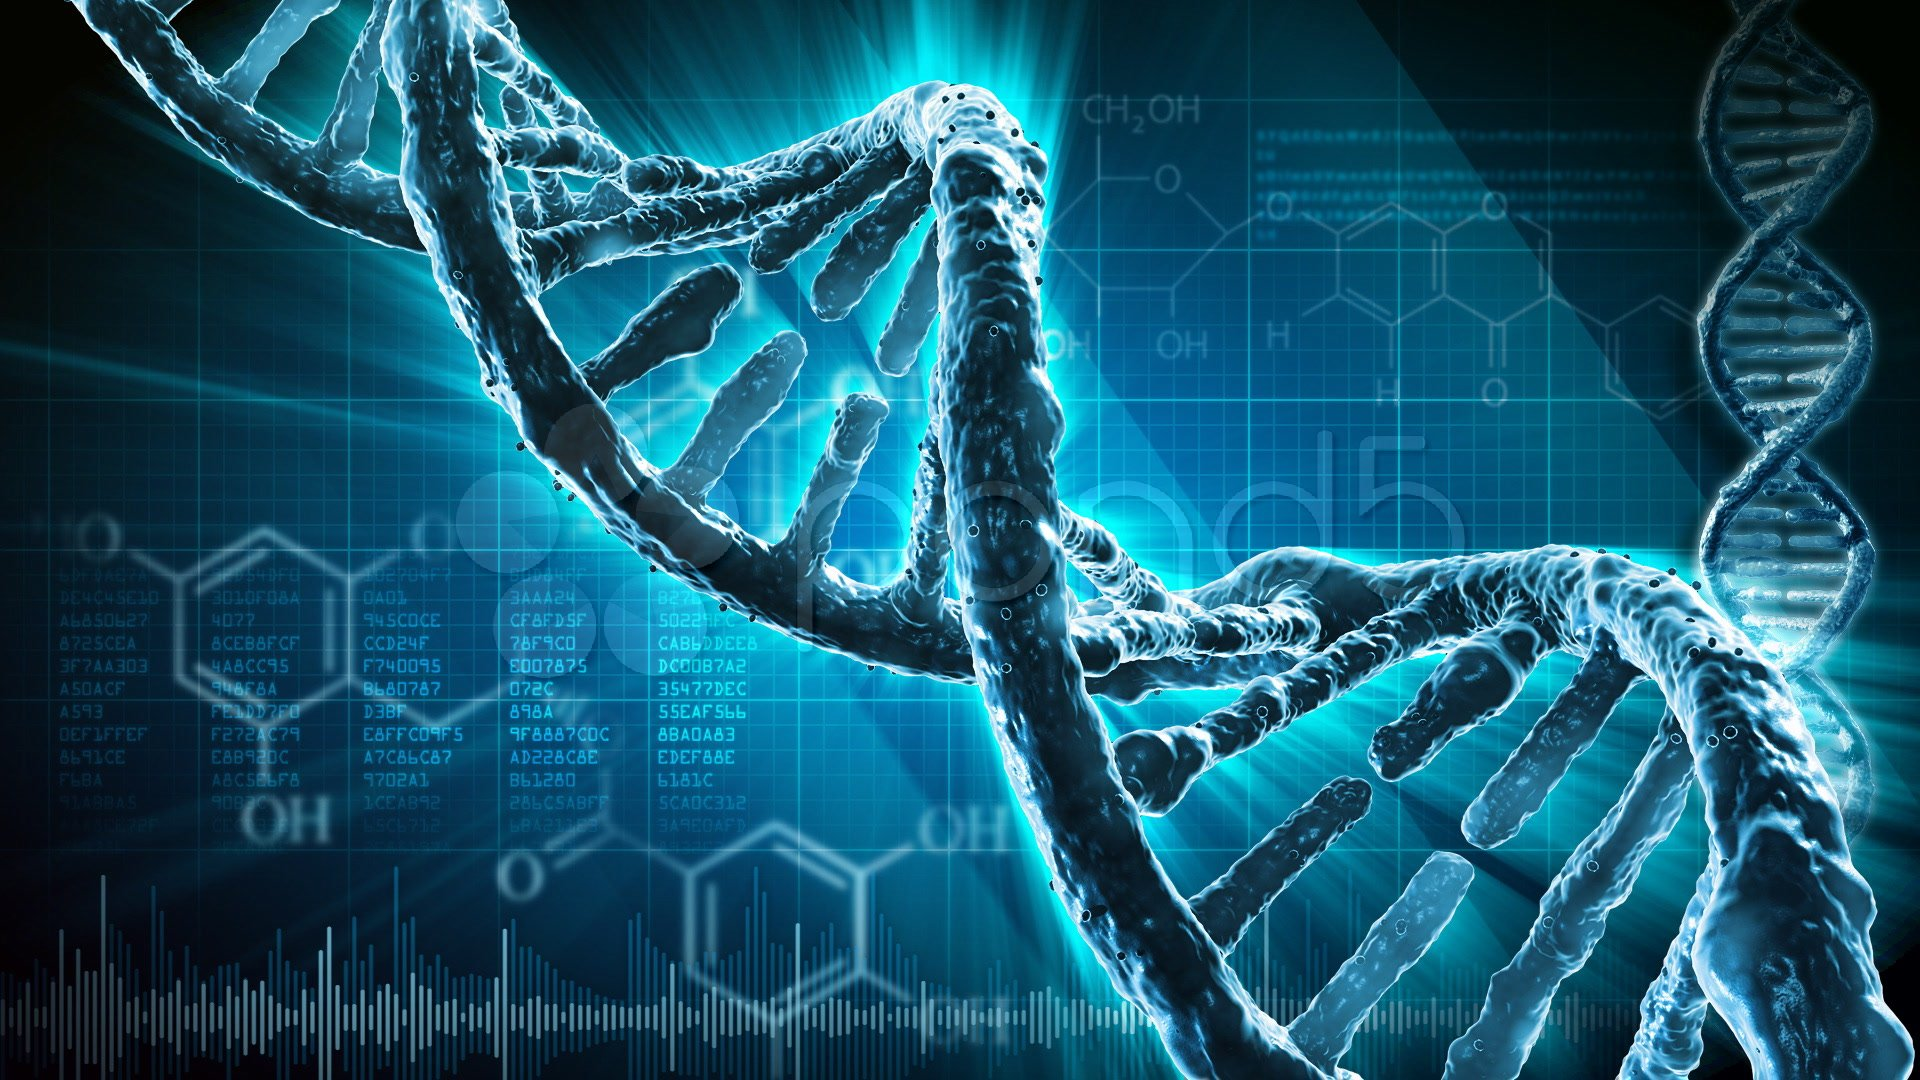 3D DNA WALLPAPER image galleries   imageKBcom 1920x1080